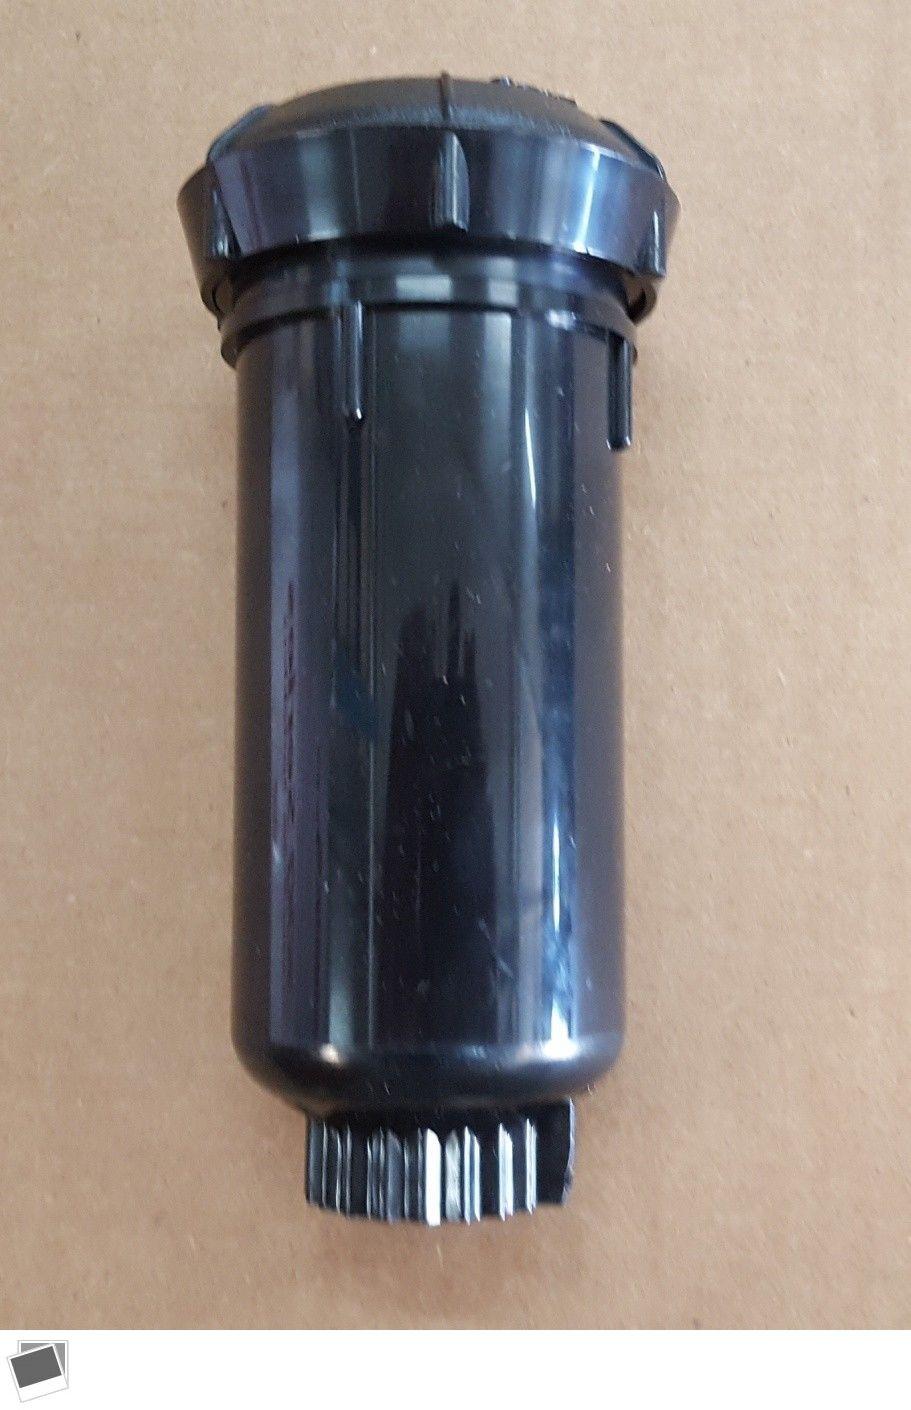 Valves 75673 Toro 300 Stream Rotor Sprinkler Less Nozzle And Arc Disc Buy It Now Only 15 On Ebay Nozzle Sprinkler Coffee Maker